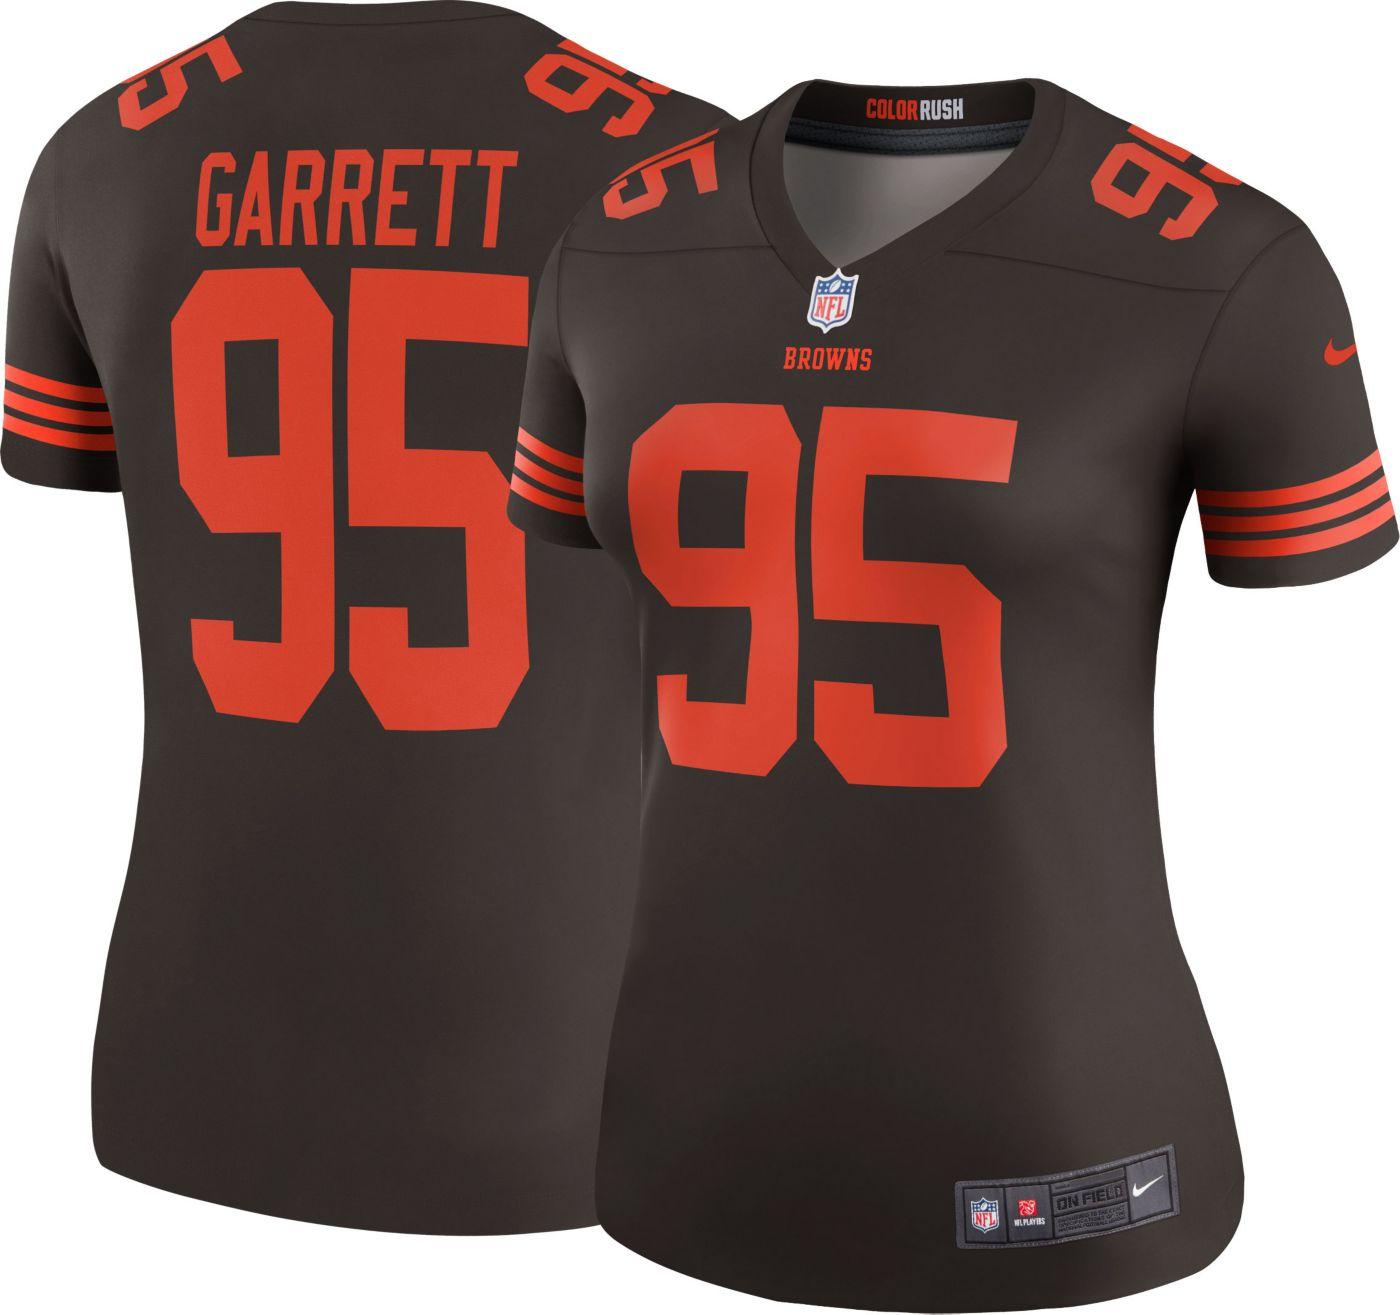 Nike Women's Color Rush Legend Jersey Cleveland Browns Myles Garrett #95